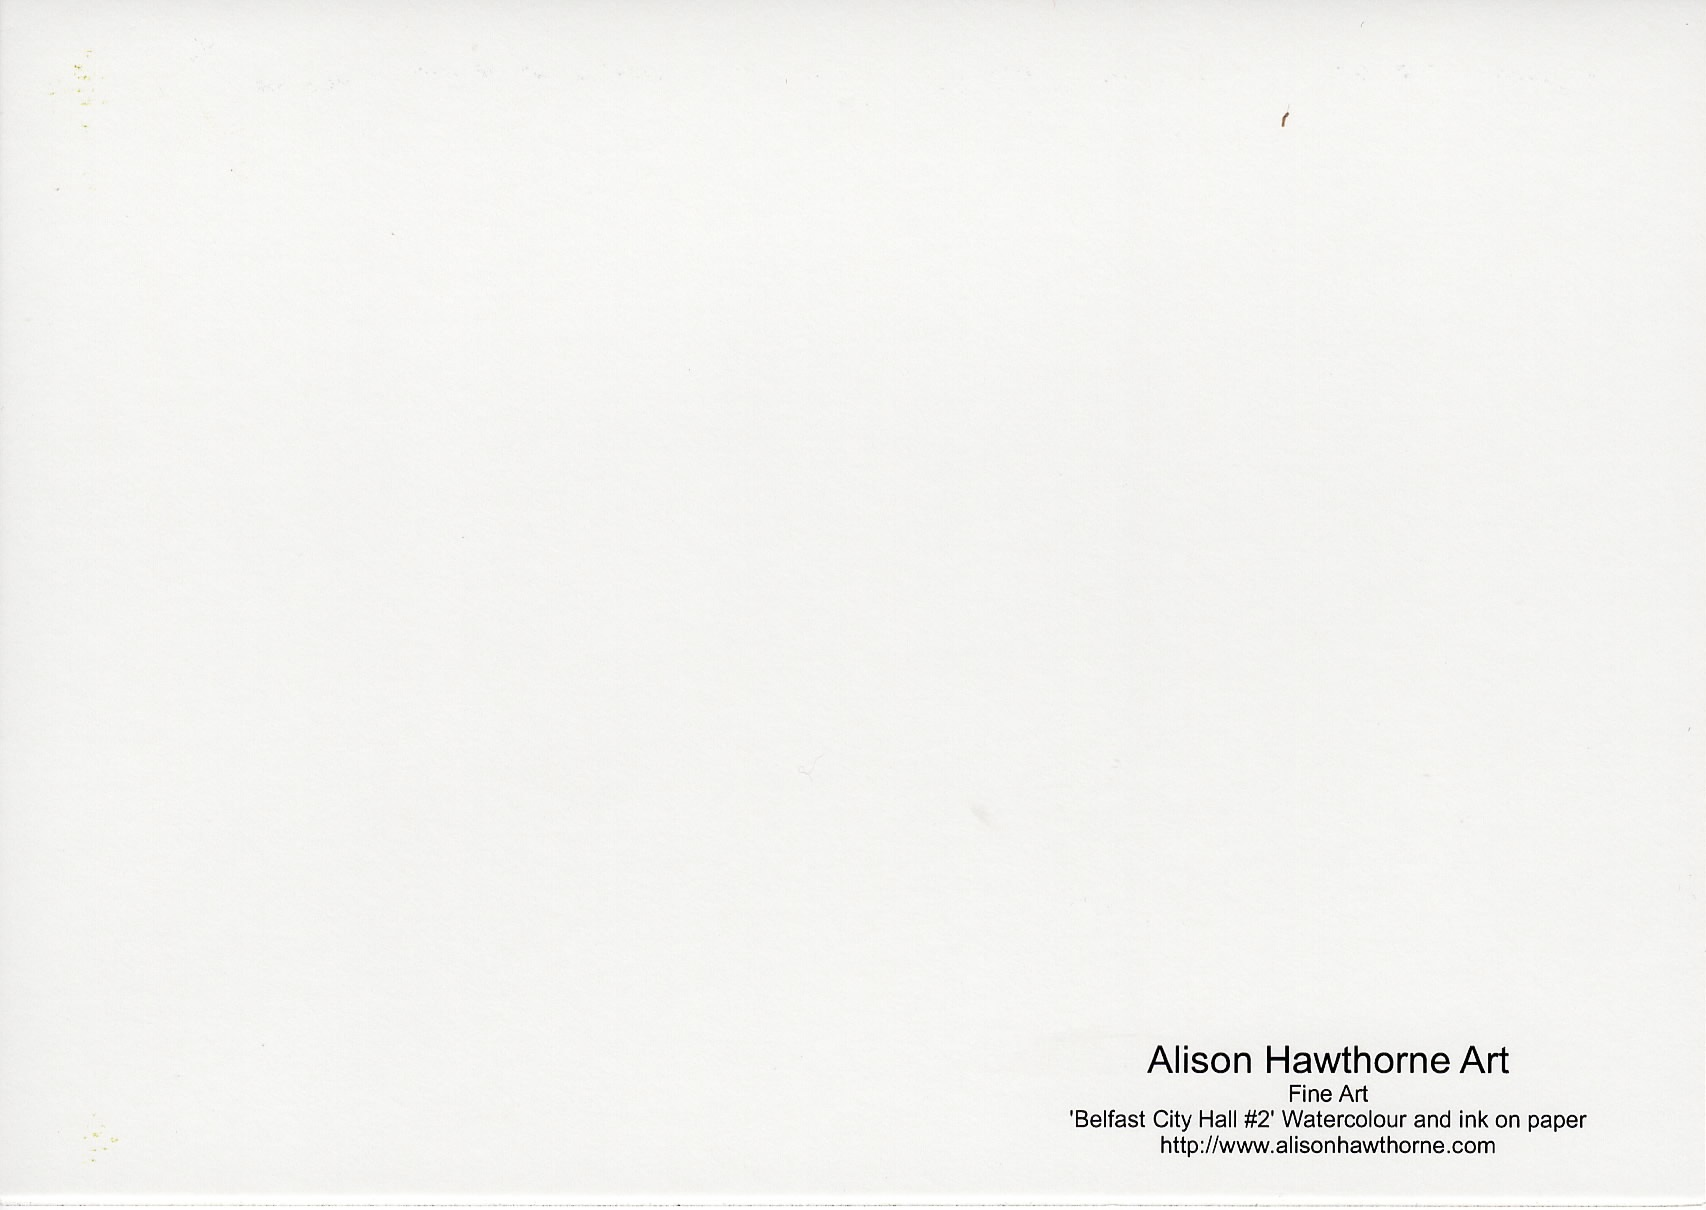 Alison Hawthorne Art